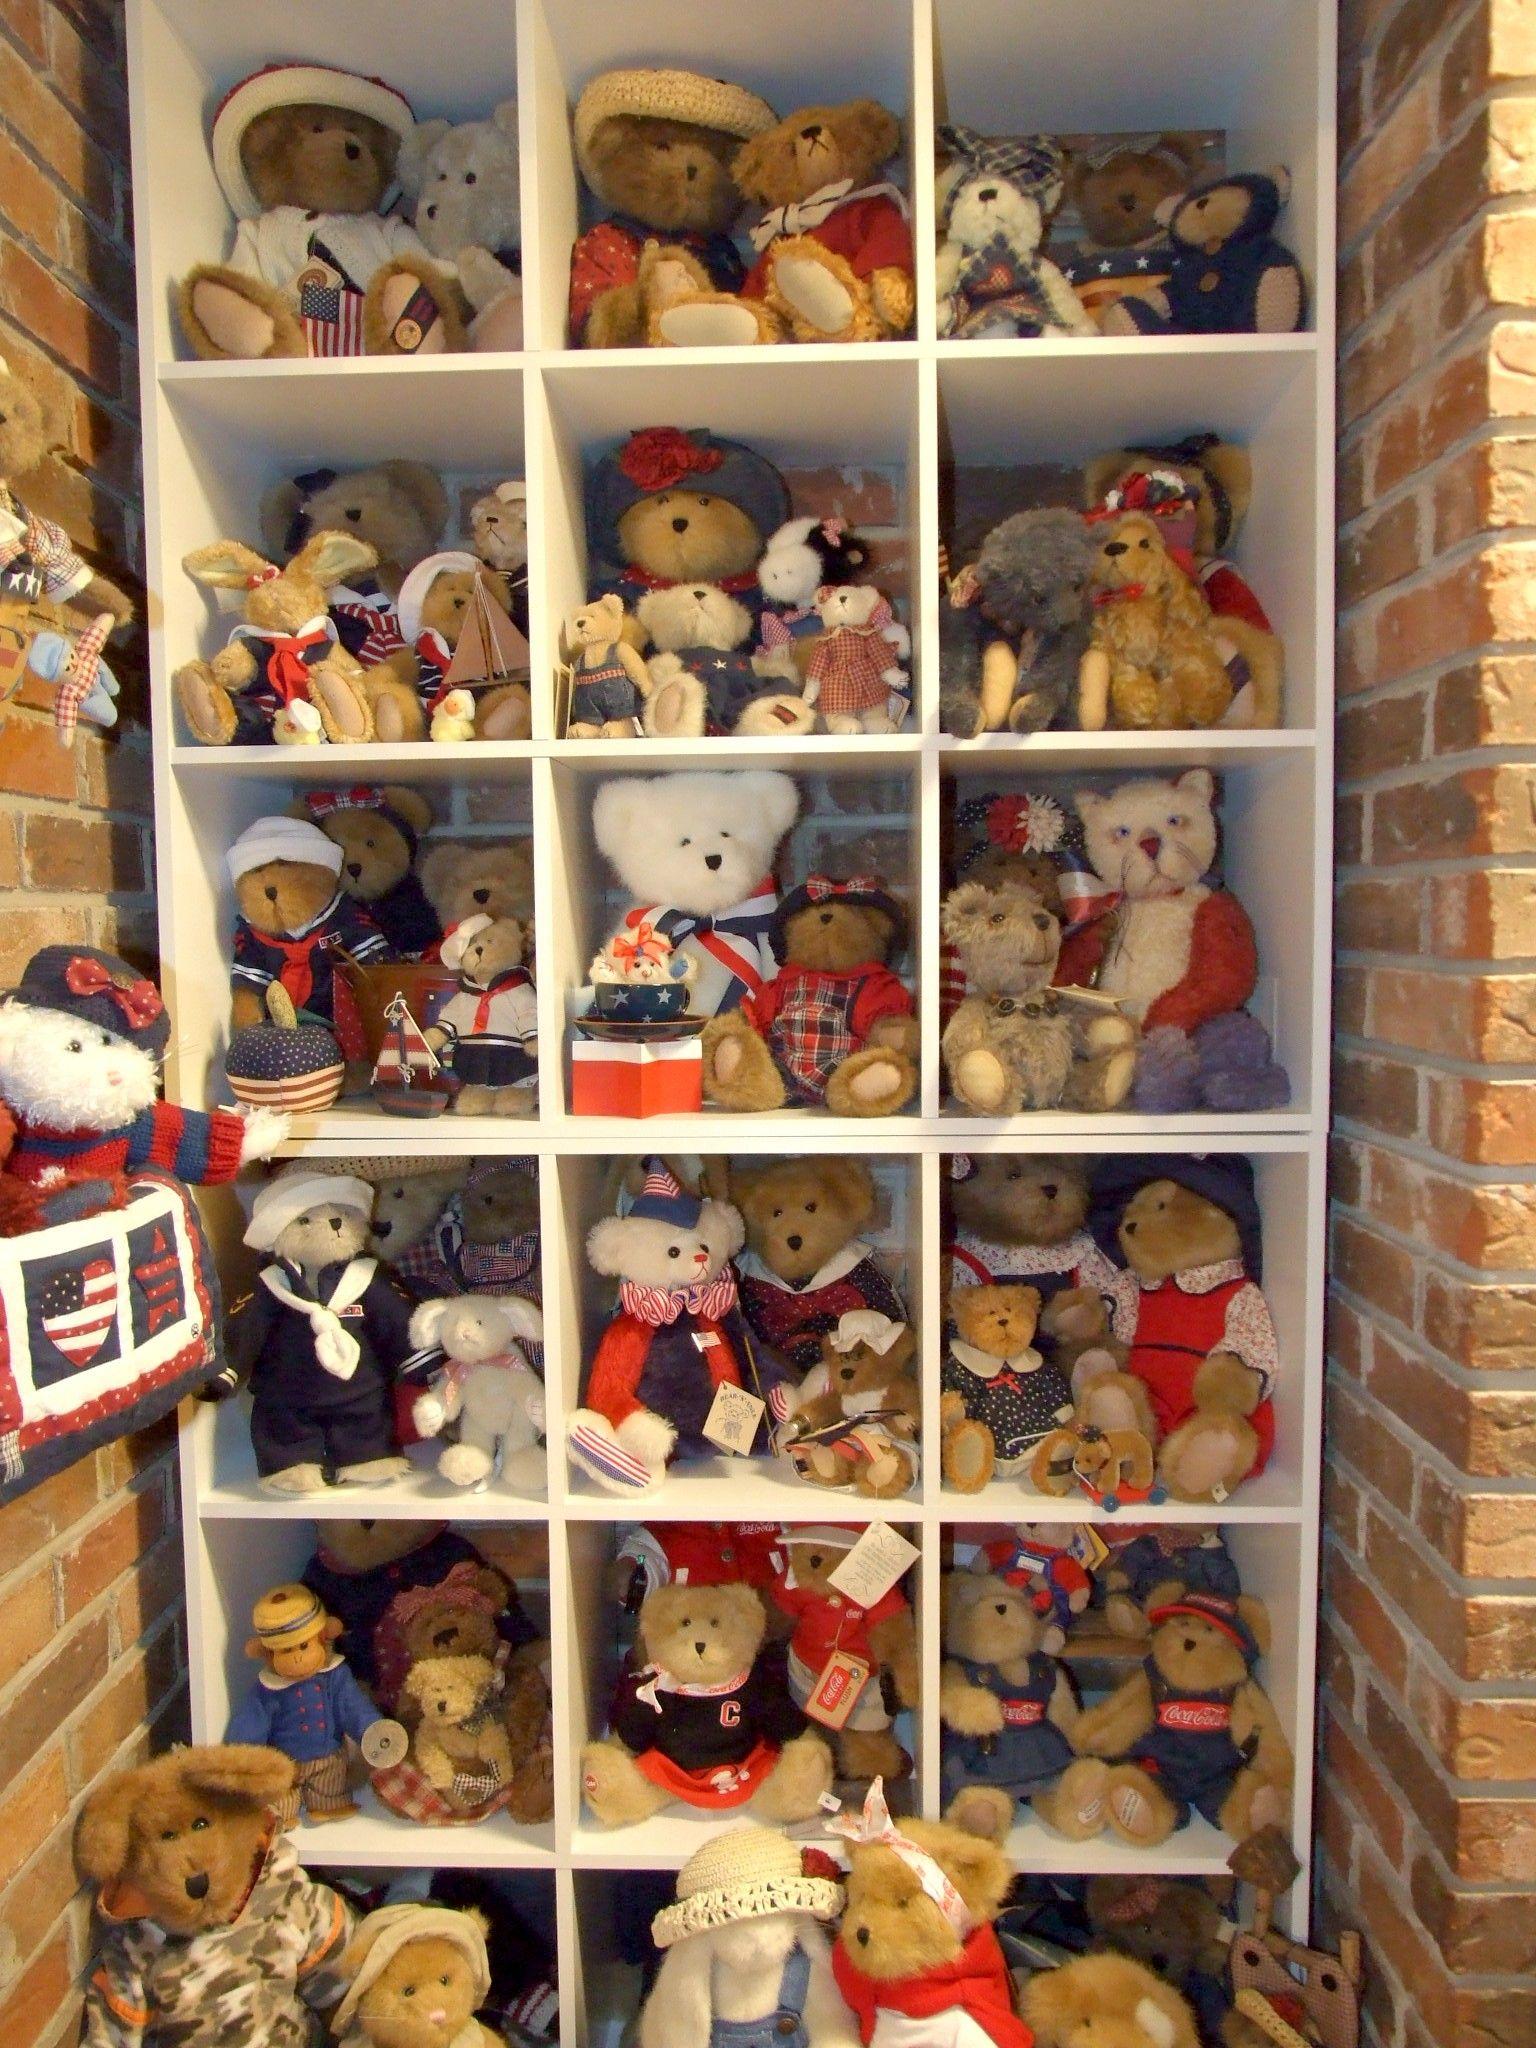 Family Room Wall Of Bears Teddy Bear Room Teddy Storage